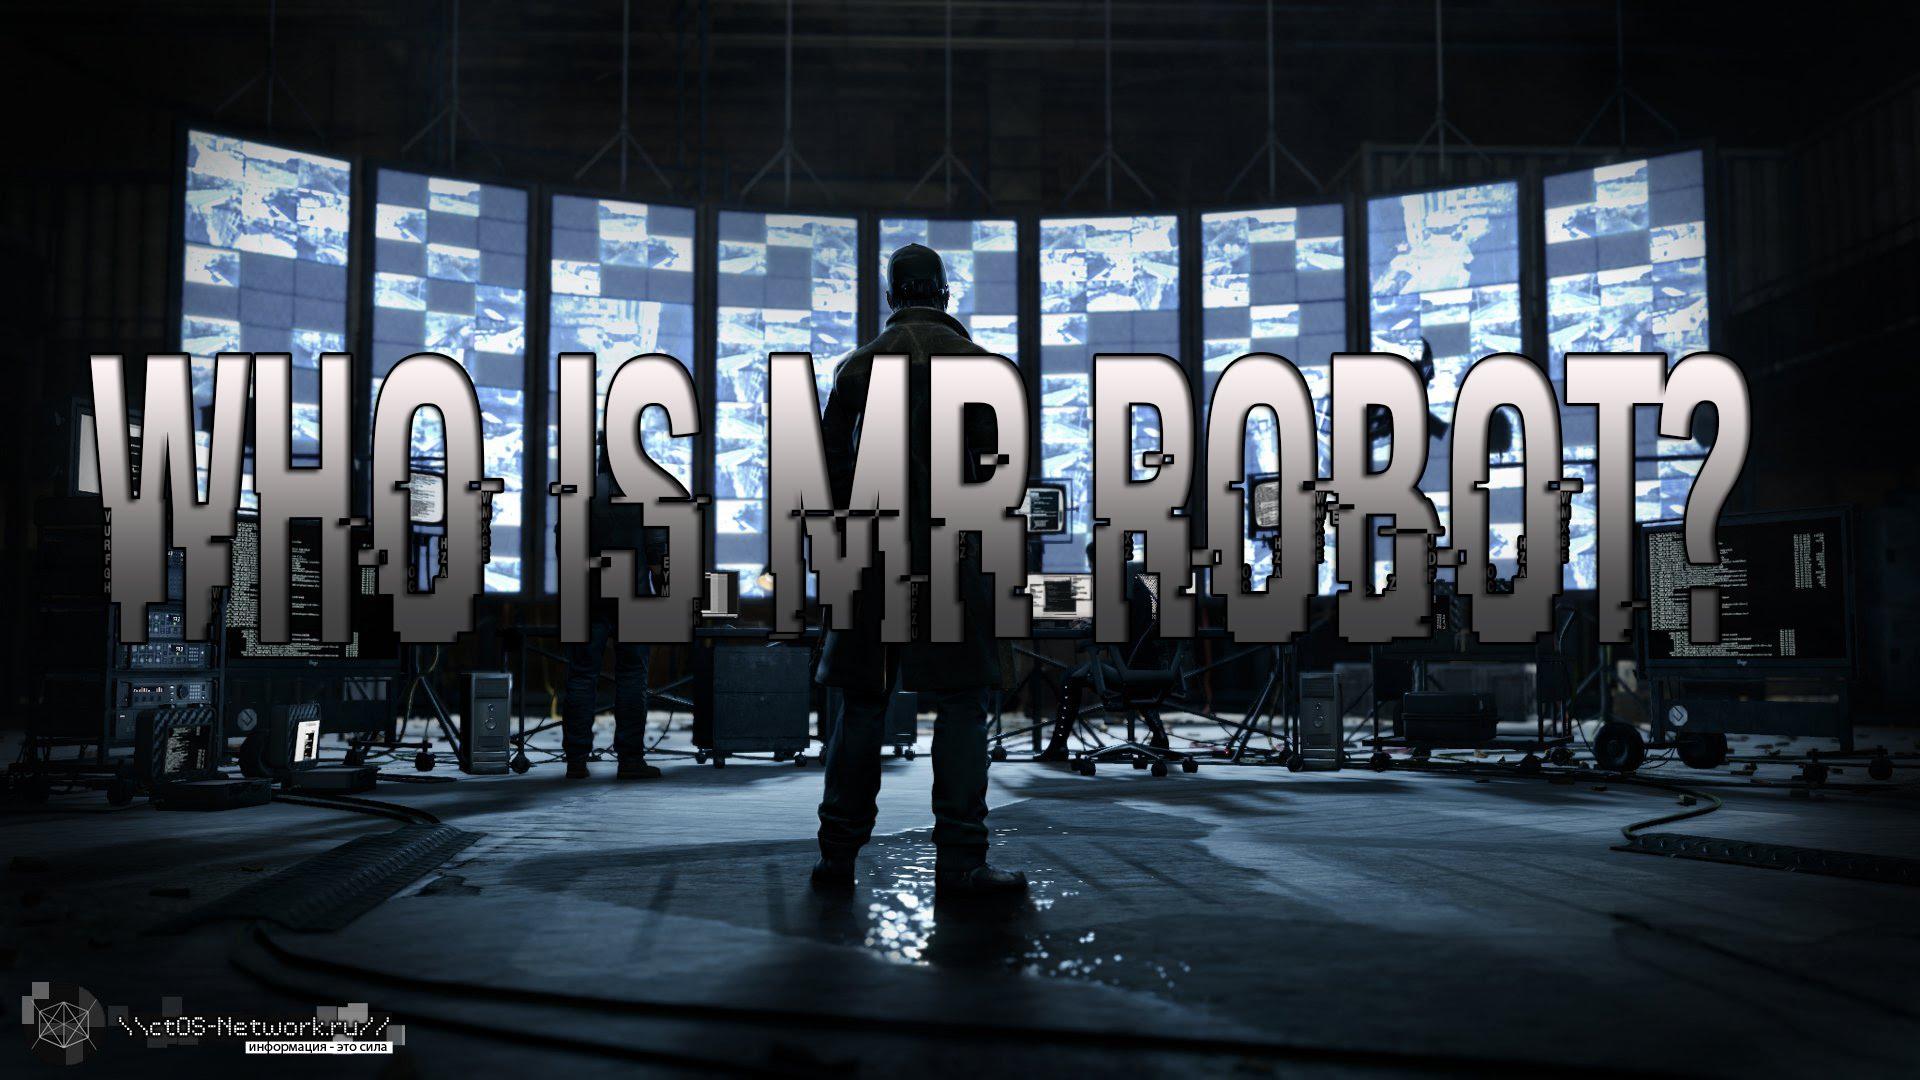 Mr Robot HD Wallpapers for desktop download 1920x1080